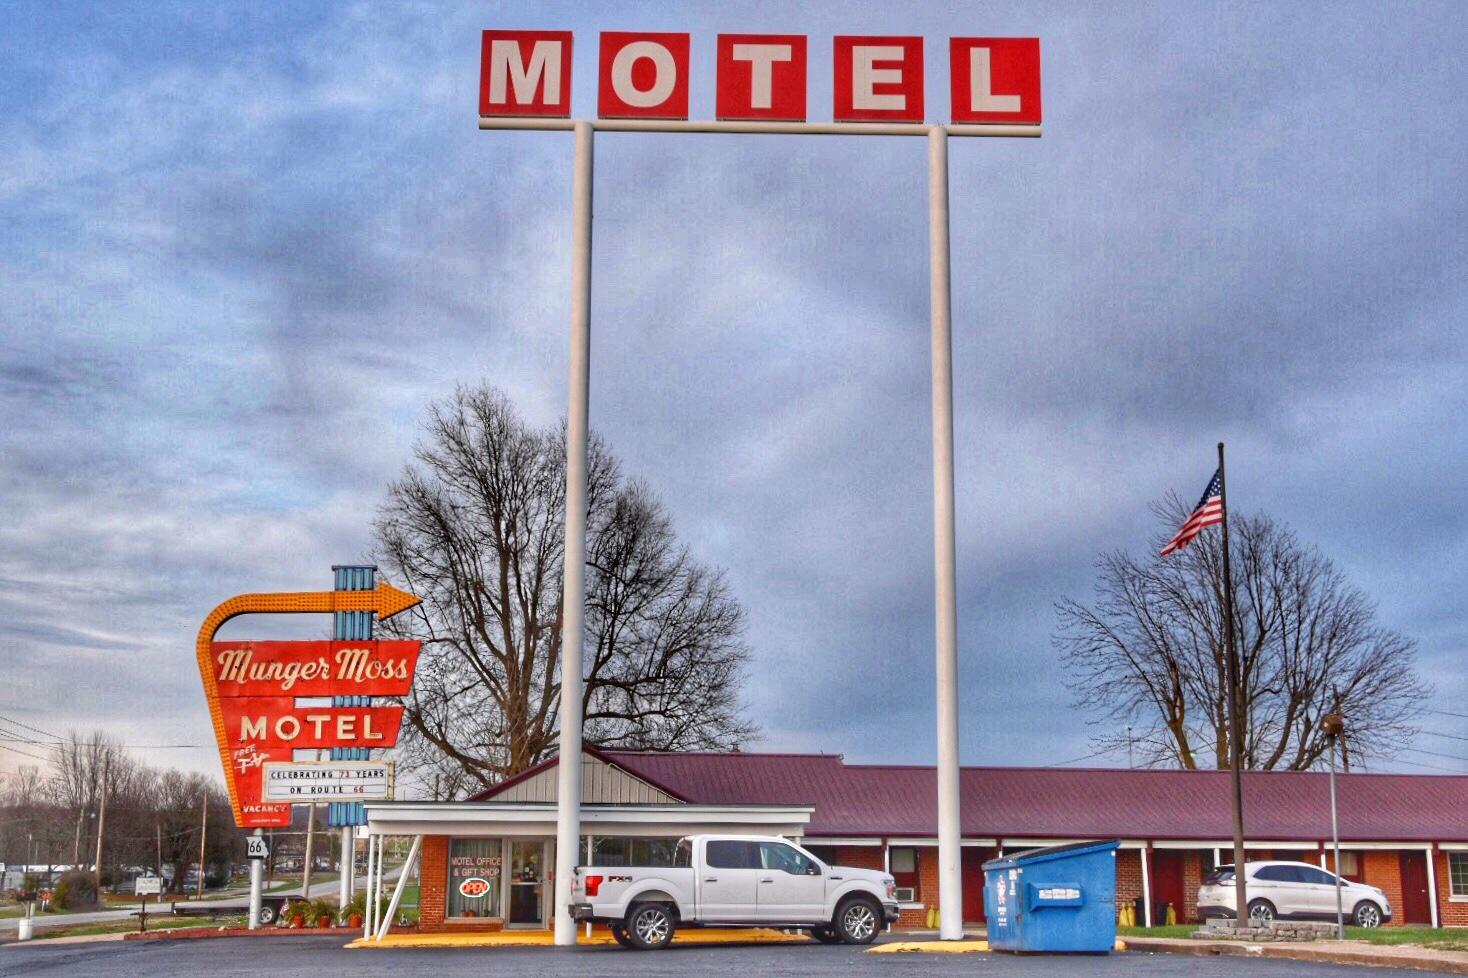 Munger Moss Motel / oh Fiddle Dee Dee